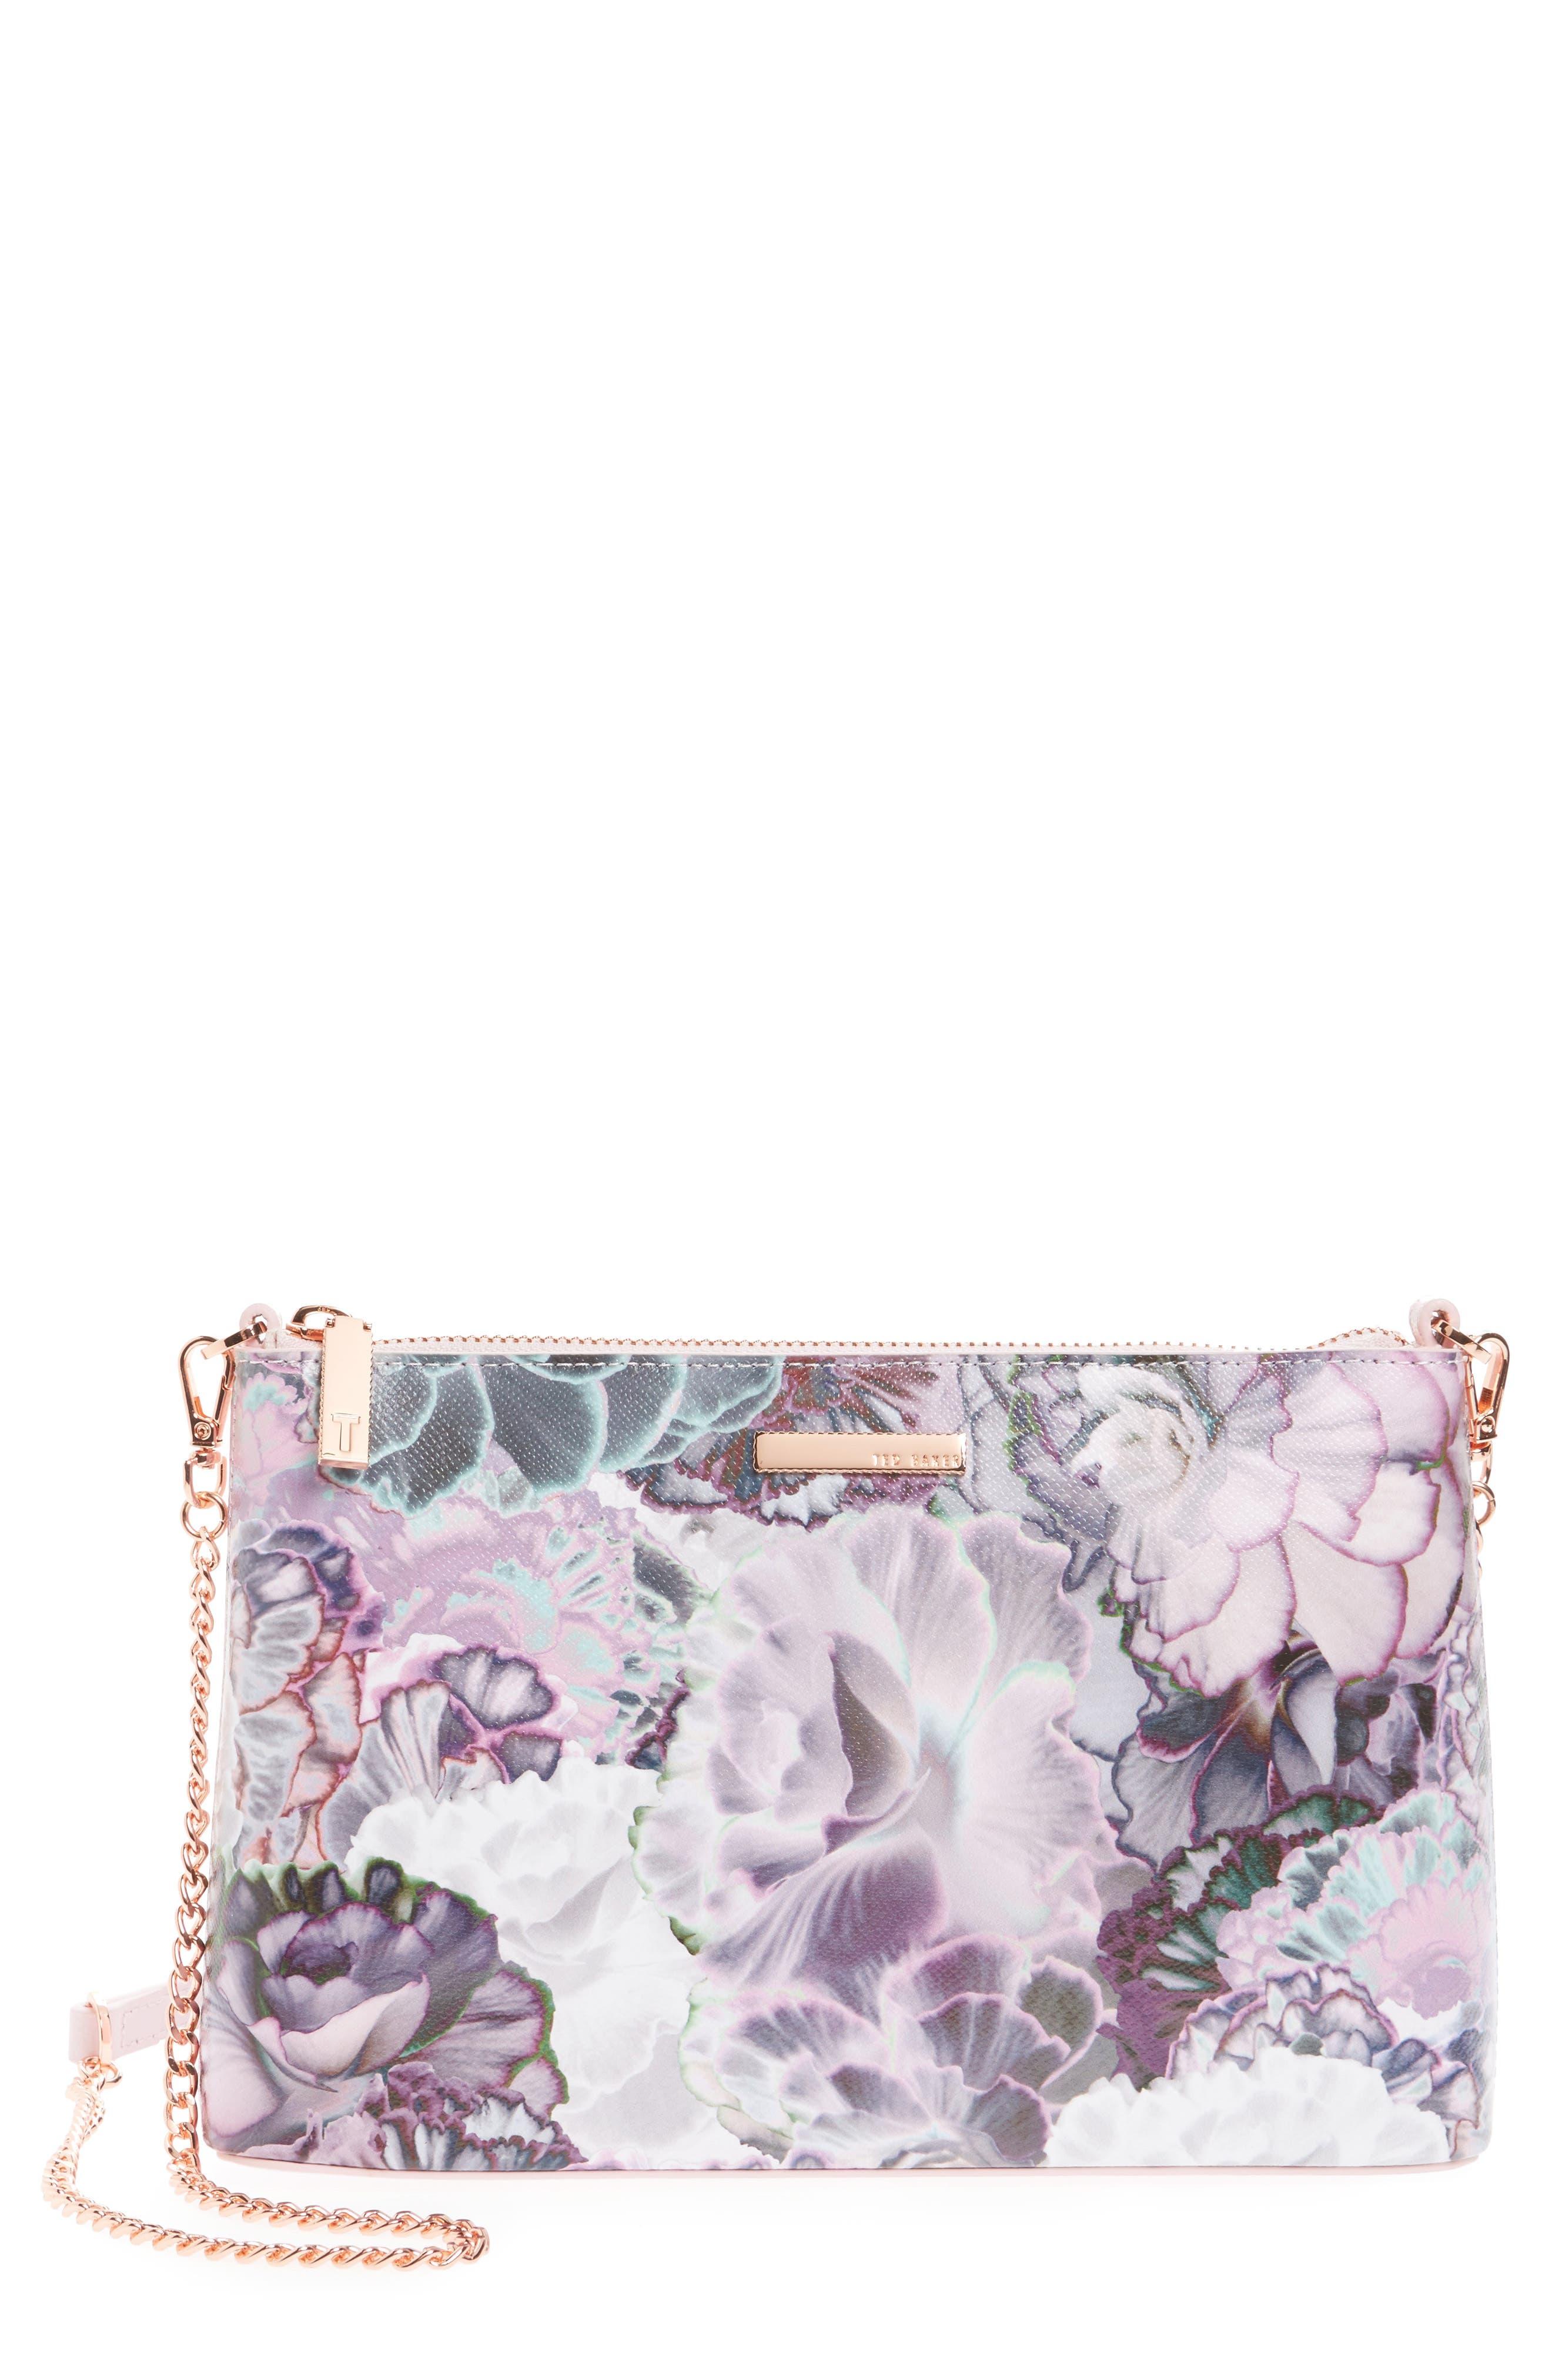 Alternate Image 1 Selected - Ted Baker London Illuminated Bloom Leather Crossbody Bag